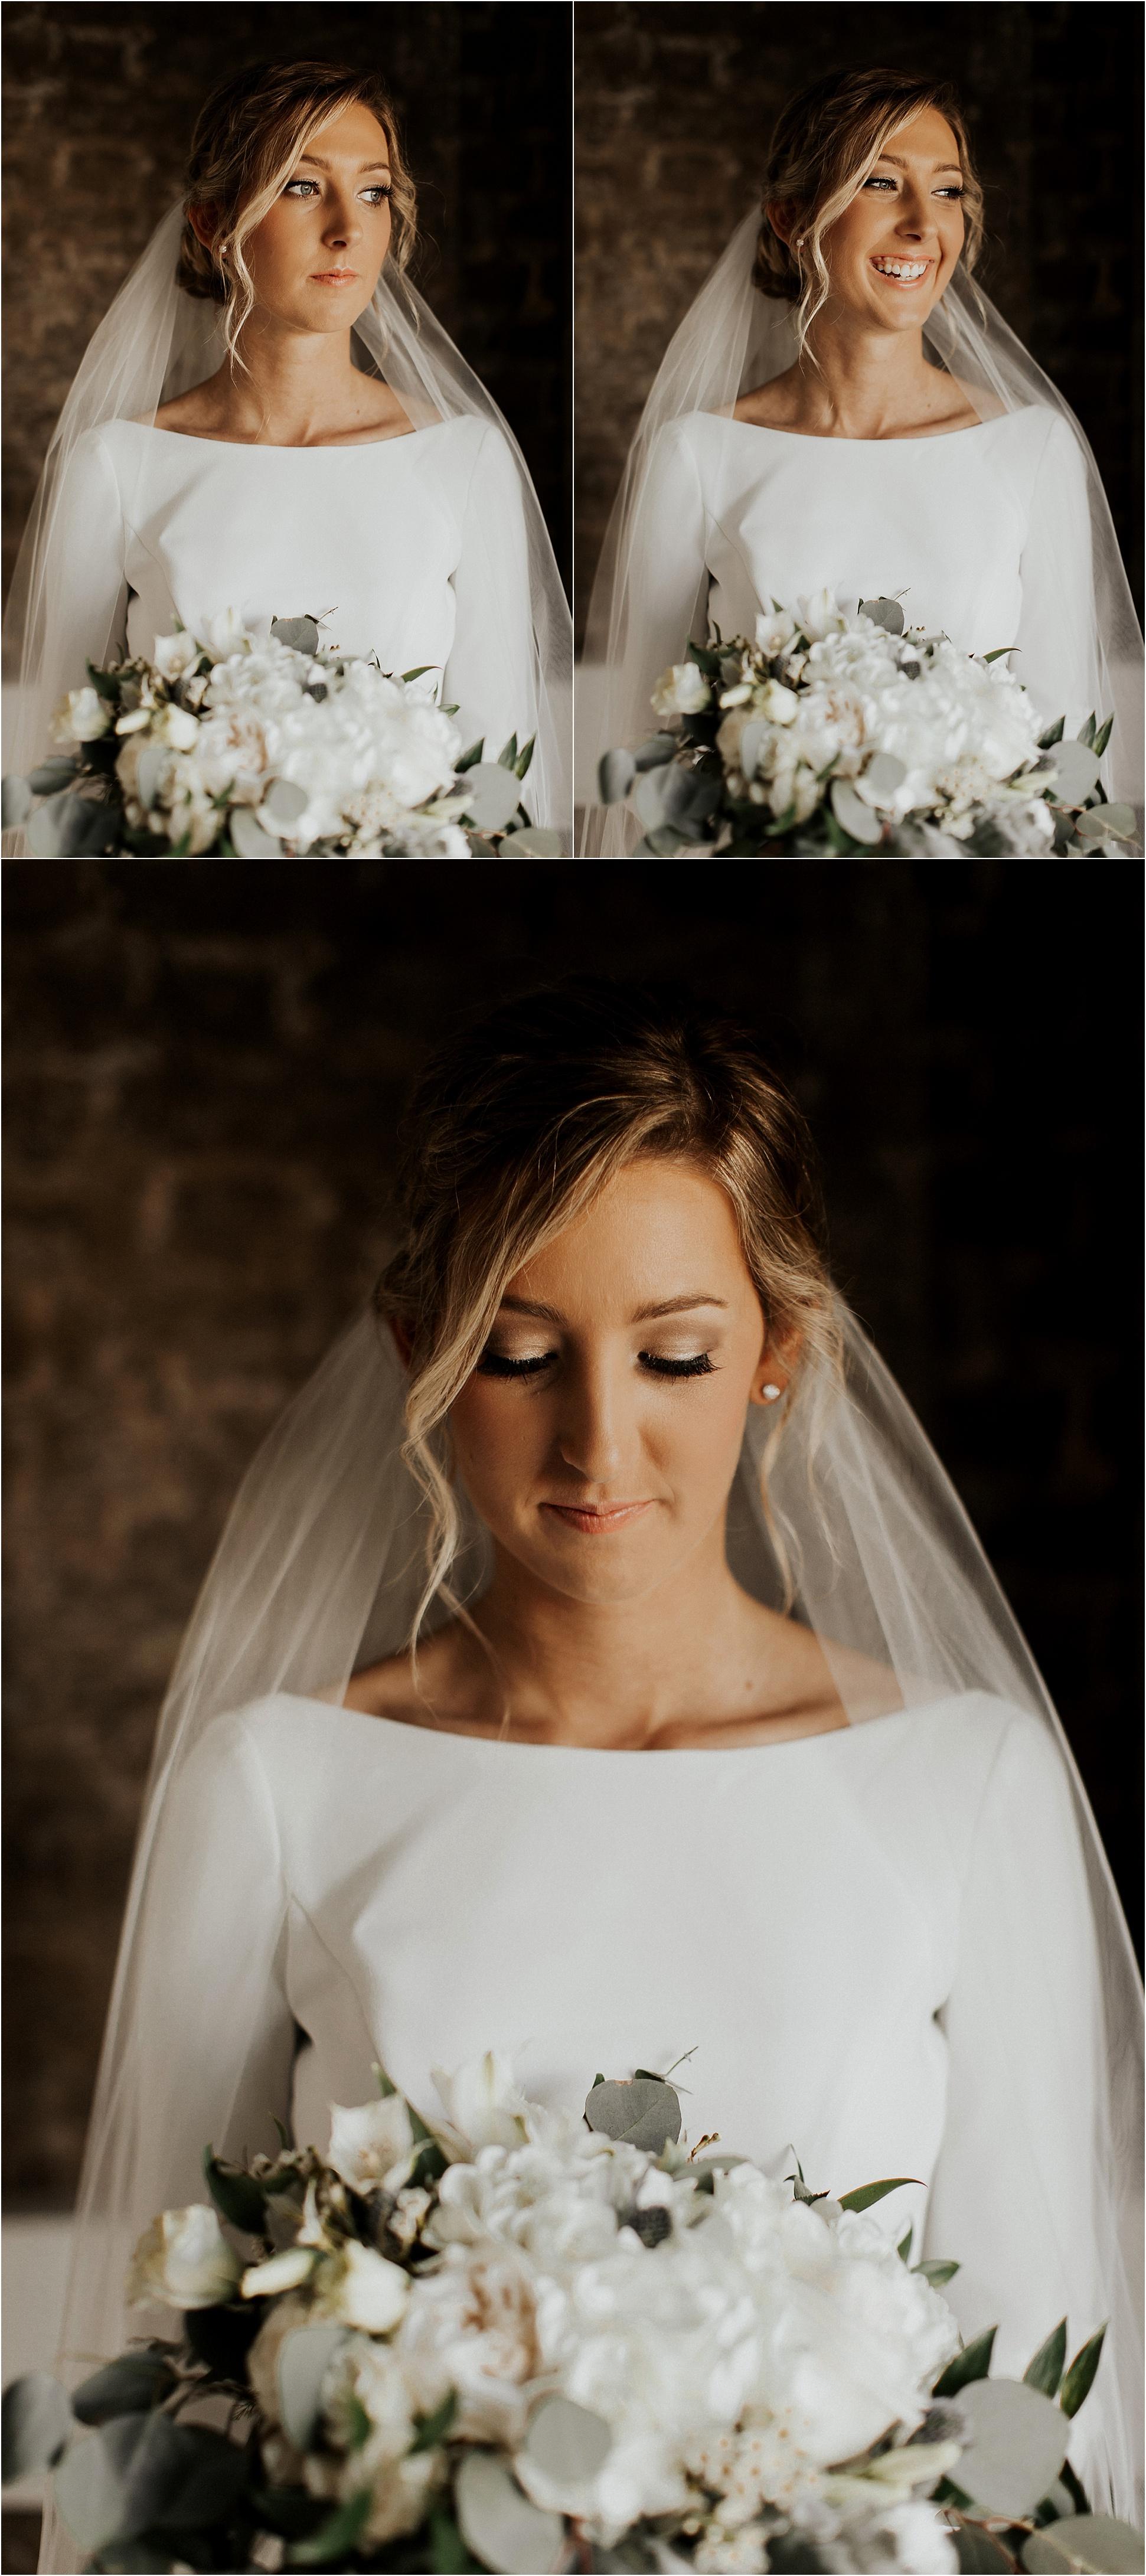 upstairs_midtown_intimate_charleston_wedding027.JPG